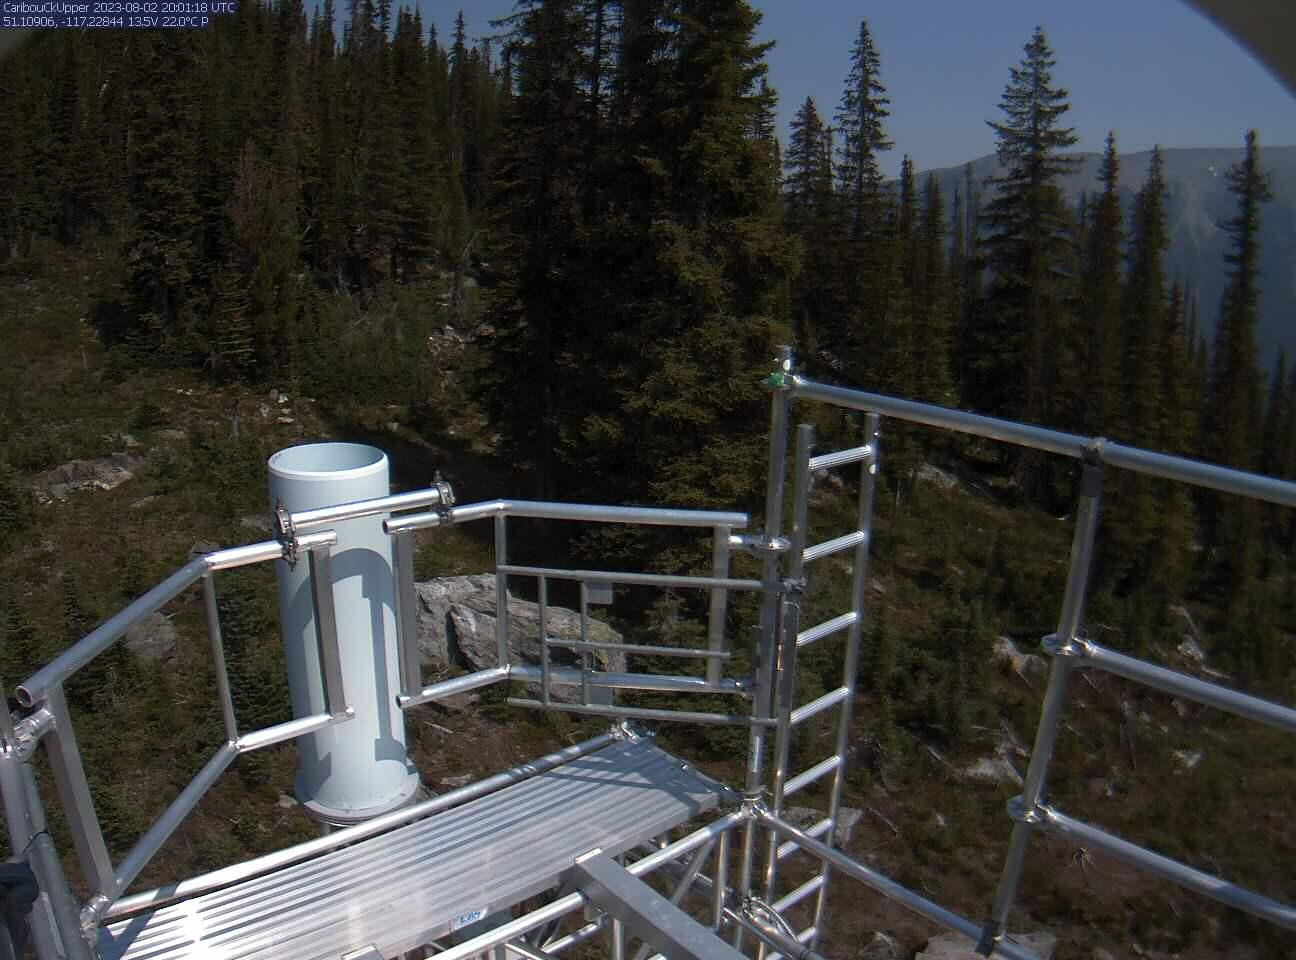 Caribou Creek Snow Satellite Camera